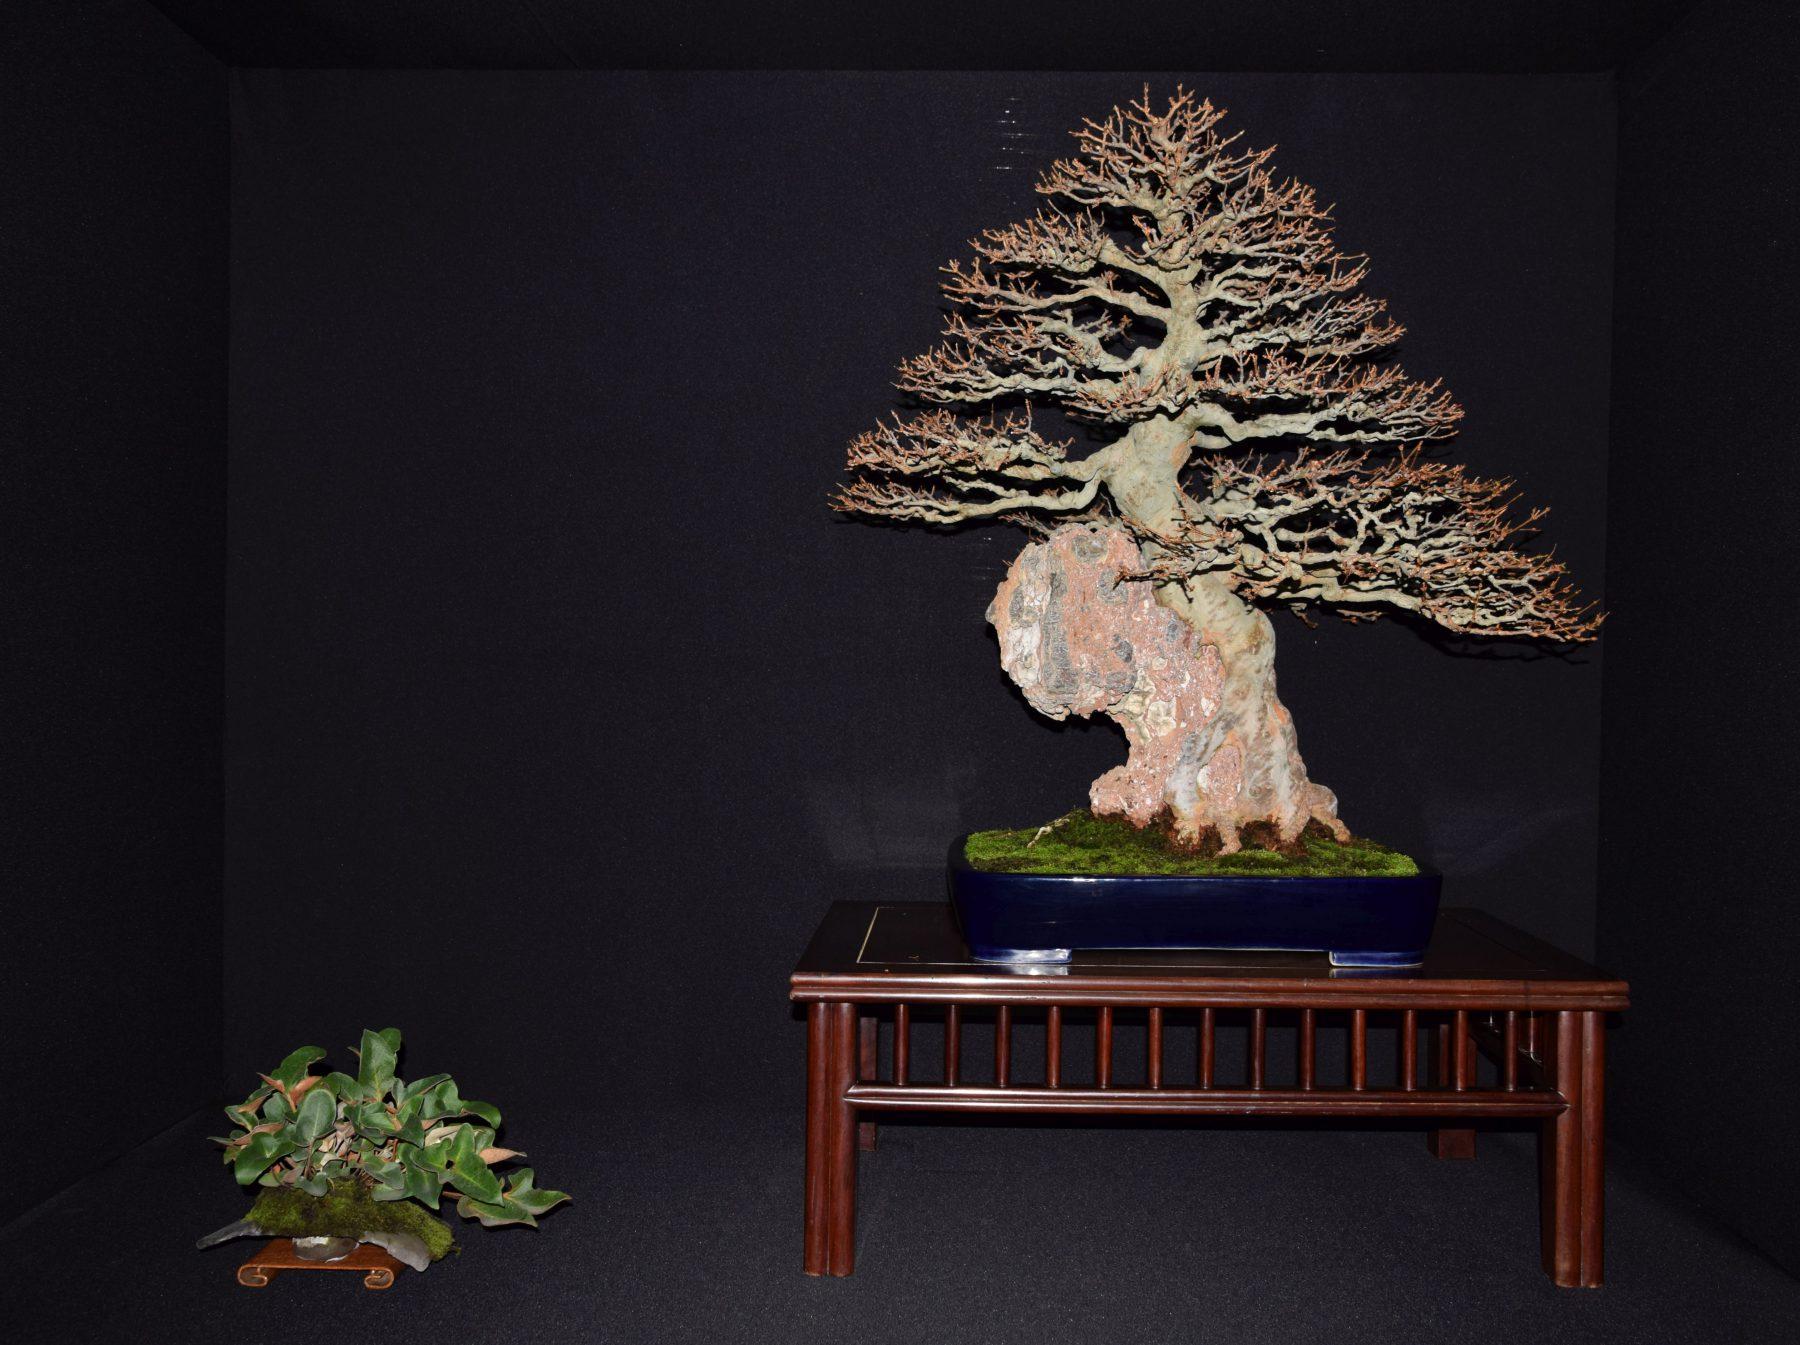 bonsai-museum-luis-vallejo-014